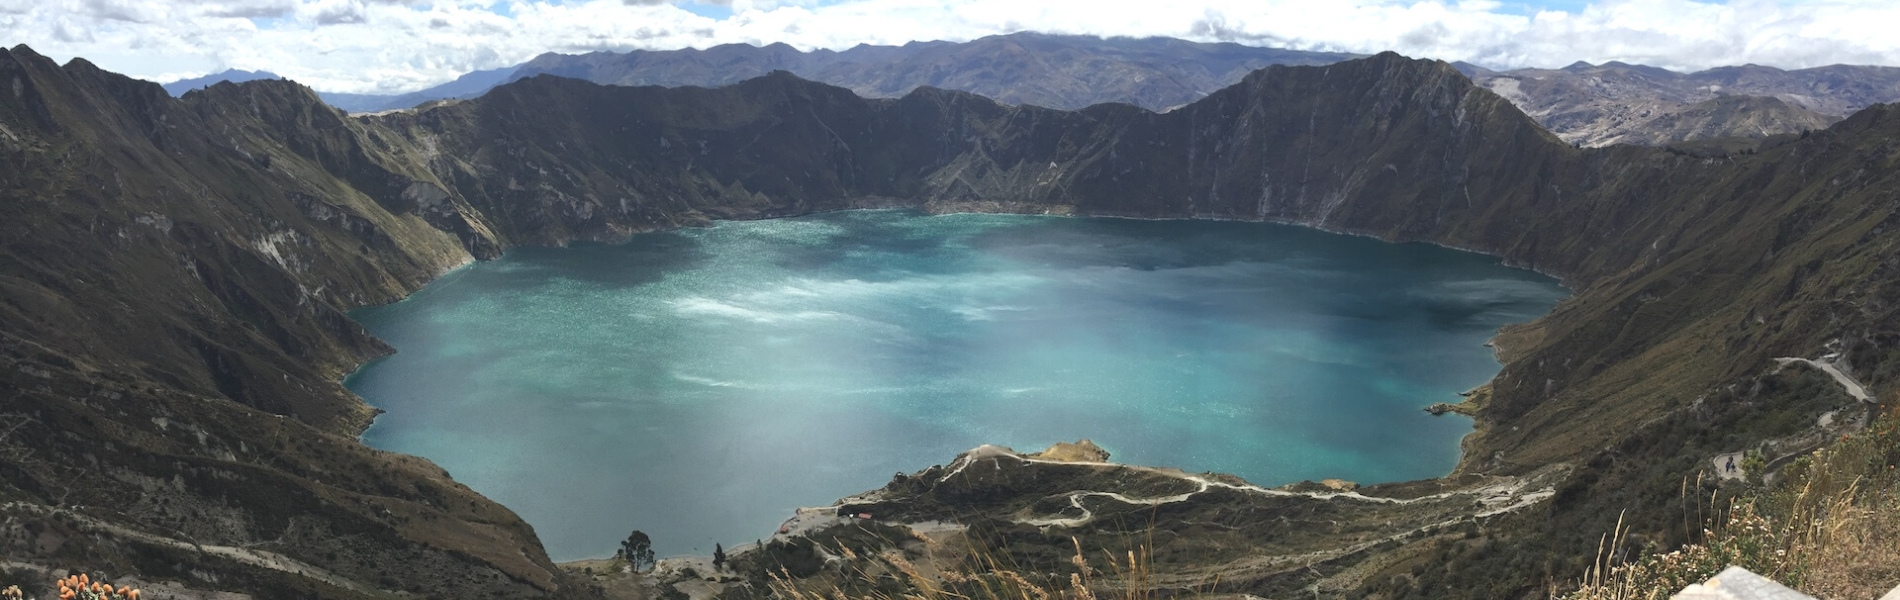 Quilotoa Loop Hiking Tour